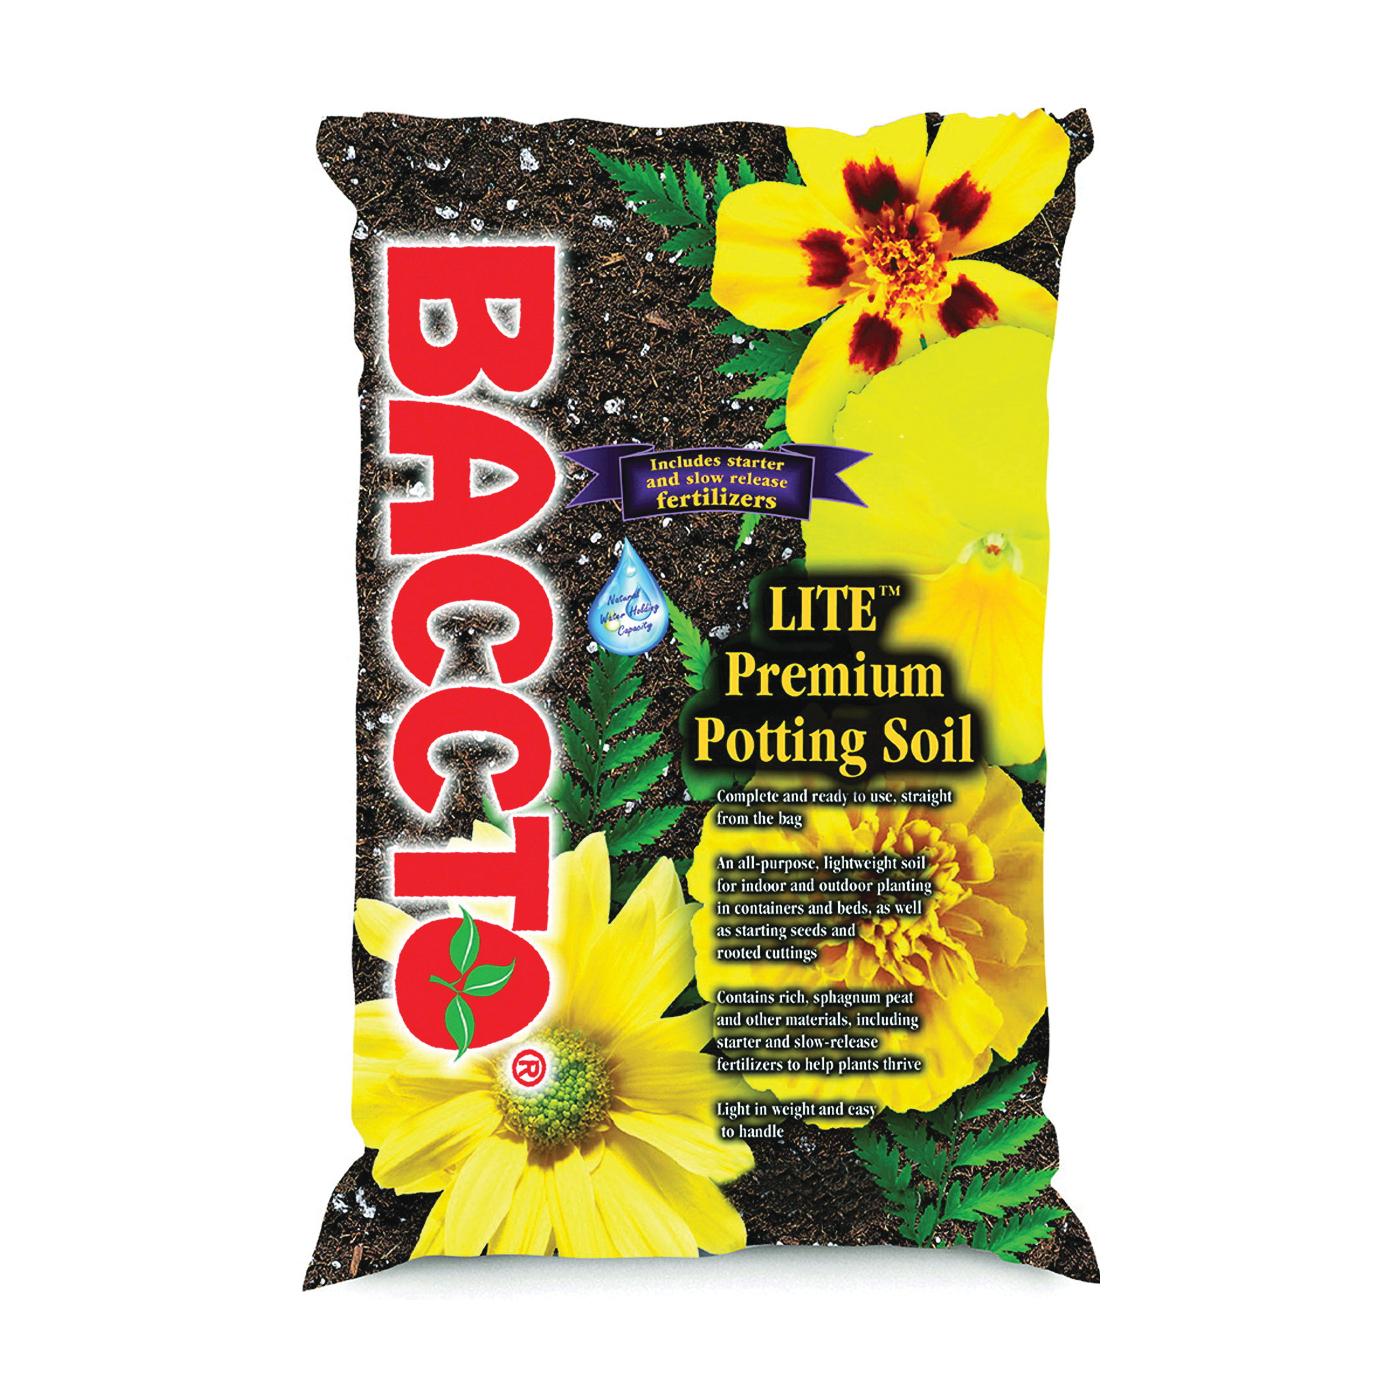 Picture of BACCTO Lite 1440P Potting Soil, 40 qt Package, Bag